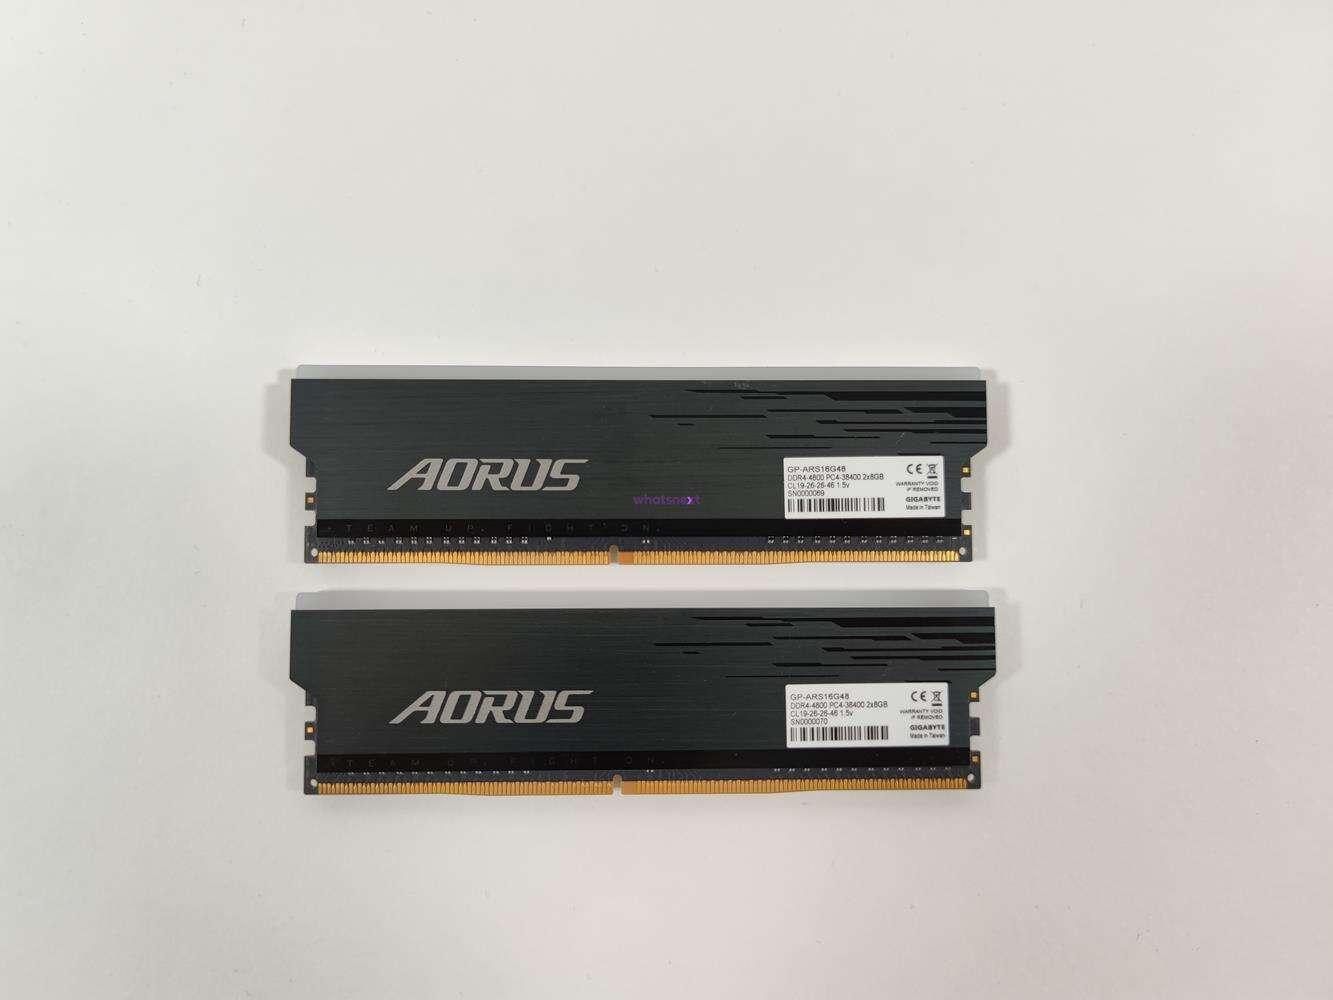 test Aorus RGB 2x 8 GB 4800 MHz, recenzja Aorus RGB 2x 8 GB 4800 MHz, opinia Aorus RGB 2x 8 GB 4800 MHz